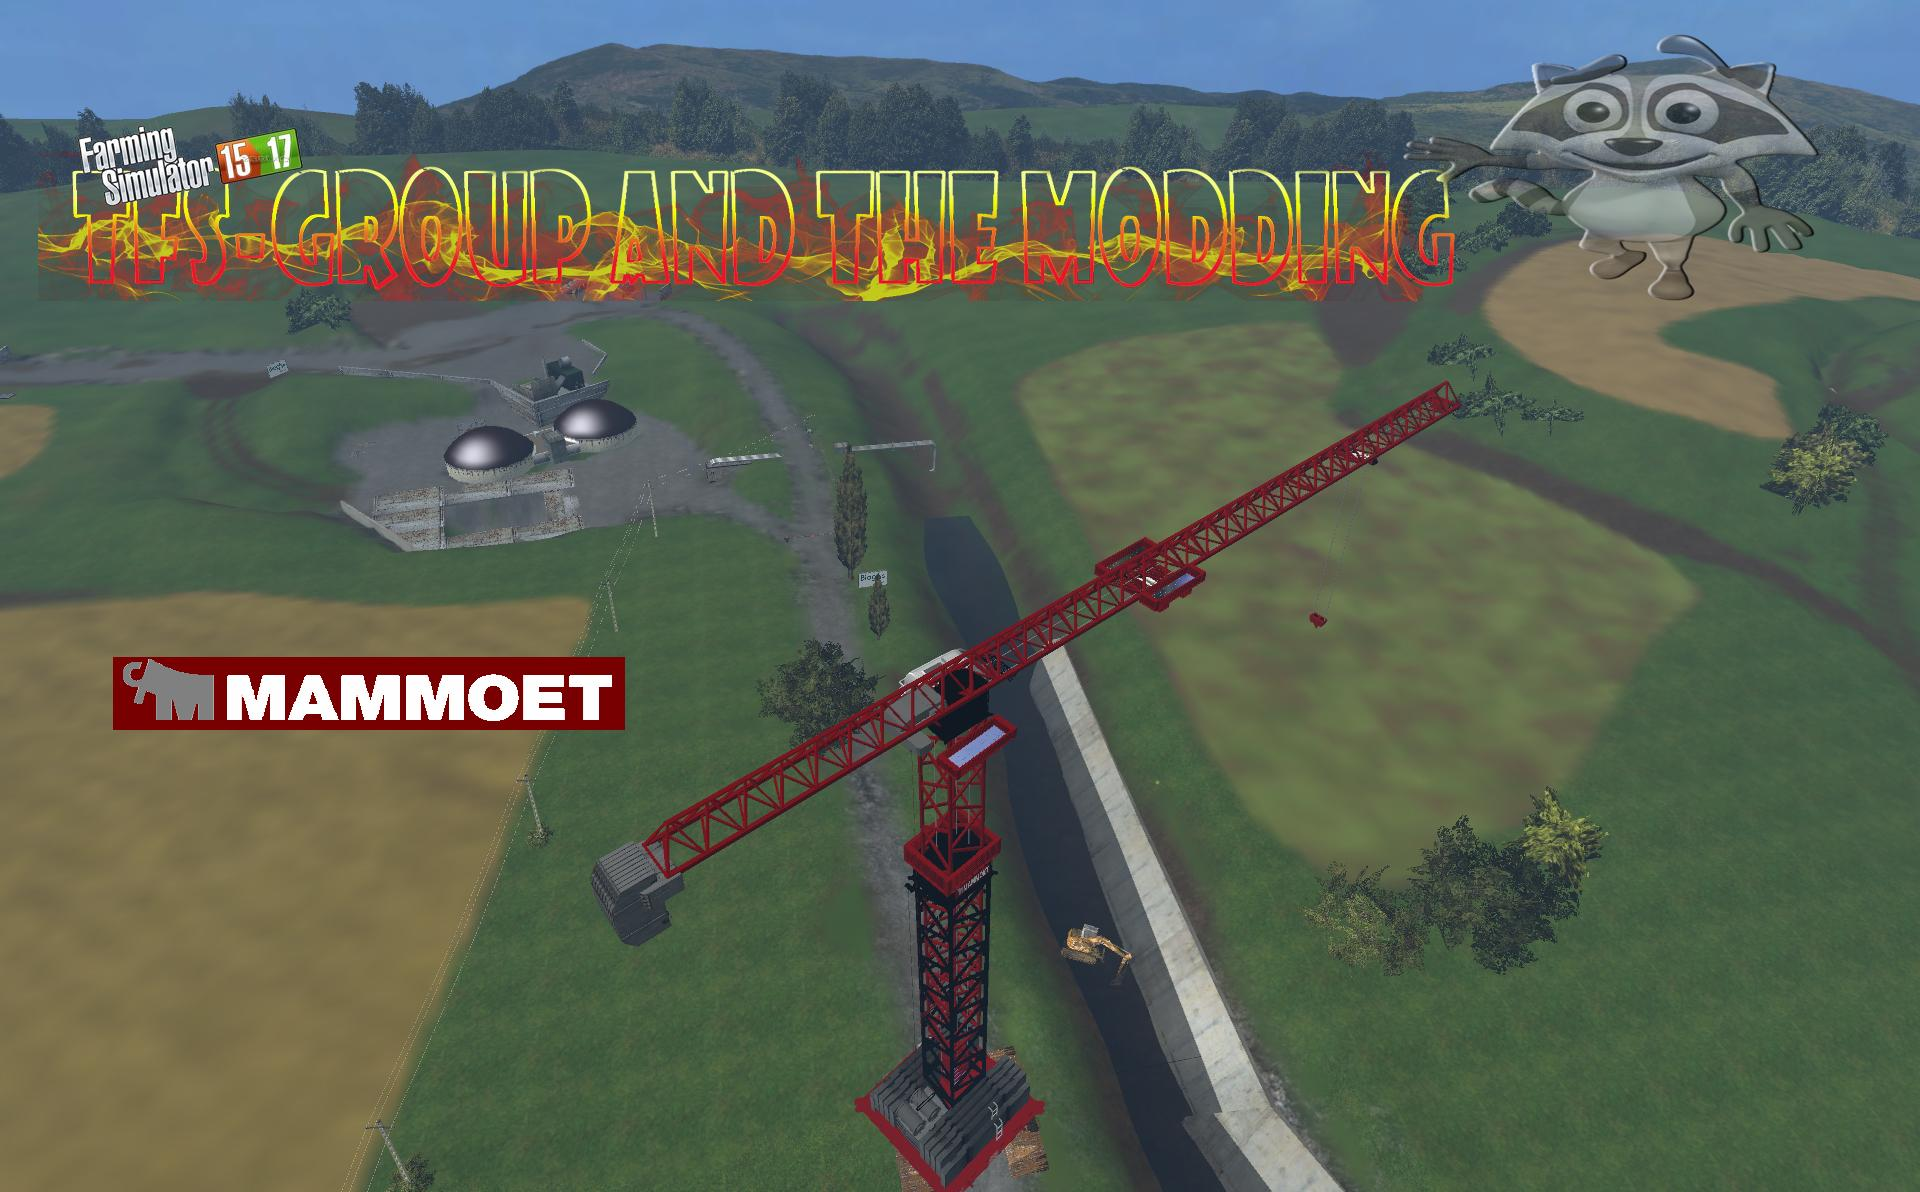 Construction Crane Simulator 2017 - The Best Construction Of 2018